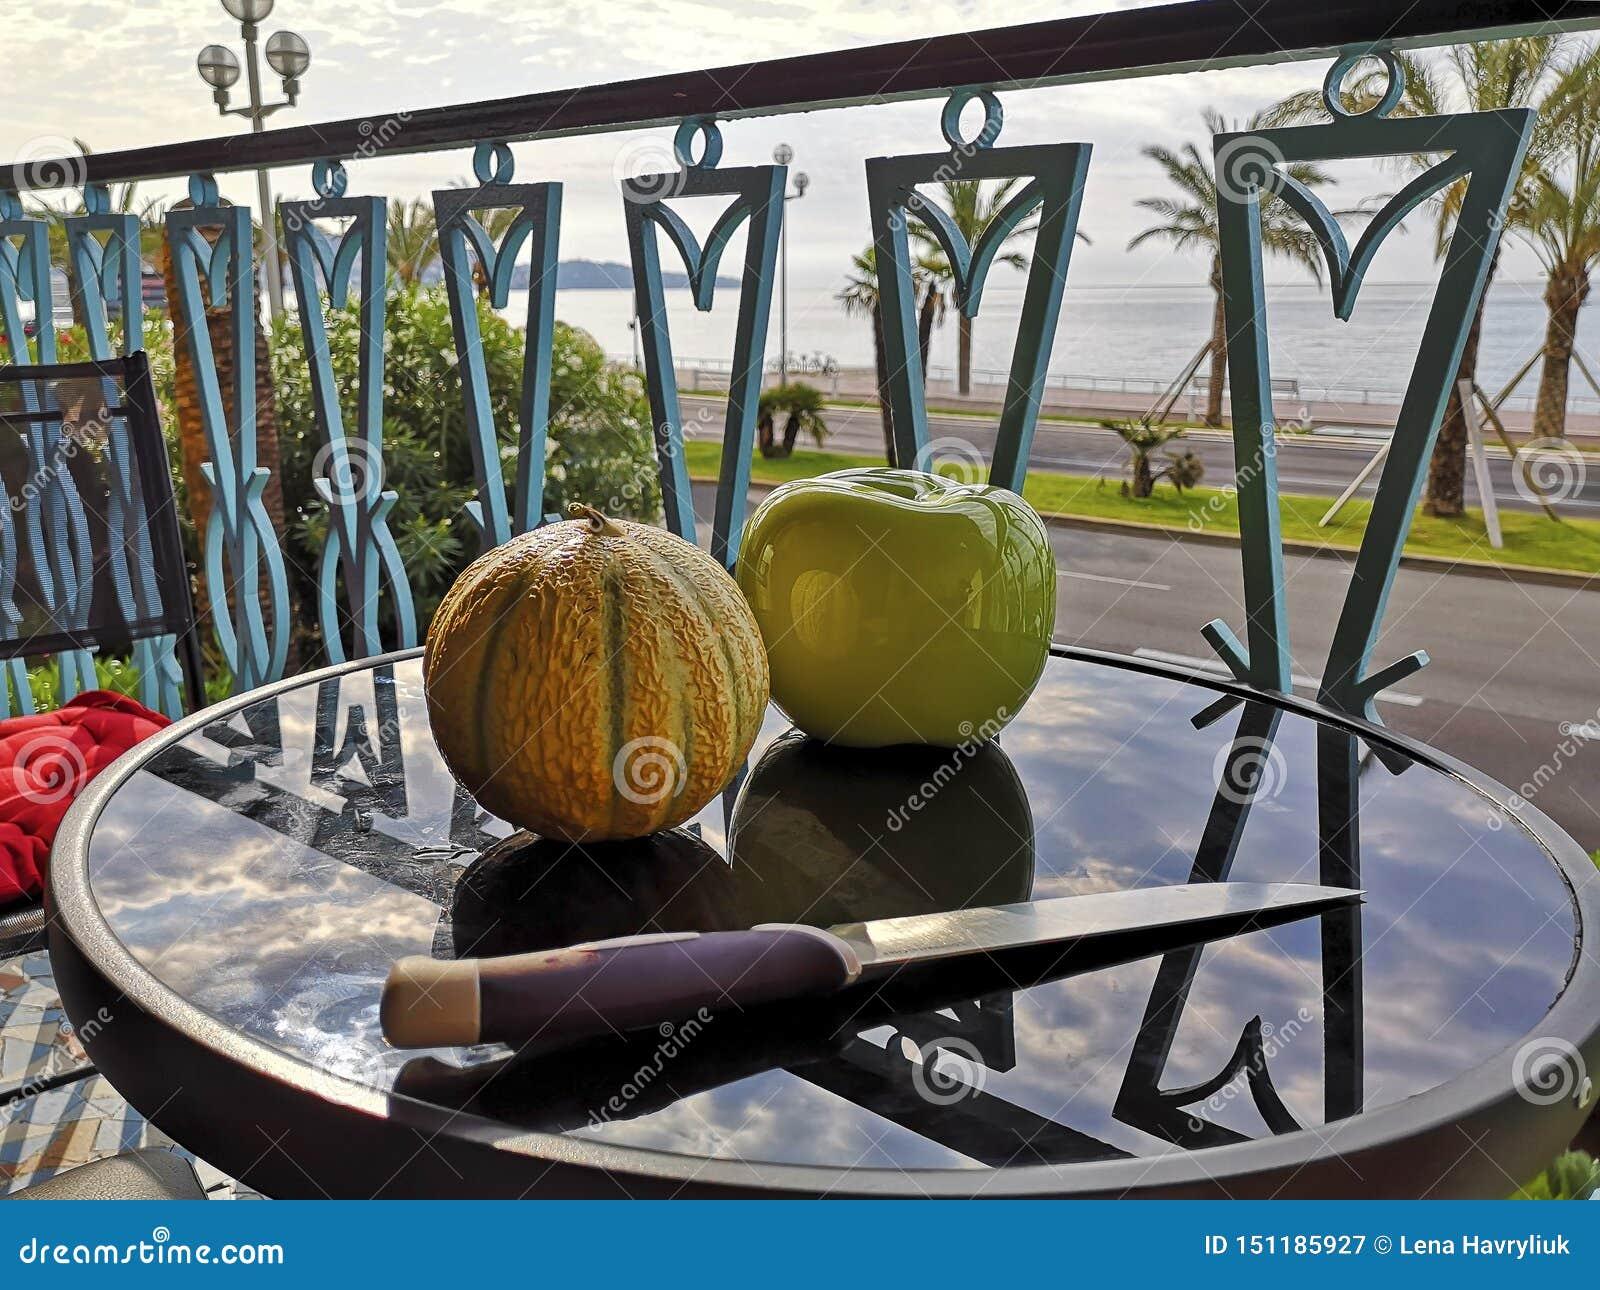 Cantalupo fresco natural y manzana artificial del mismo tamaño